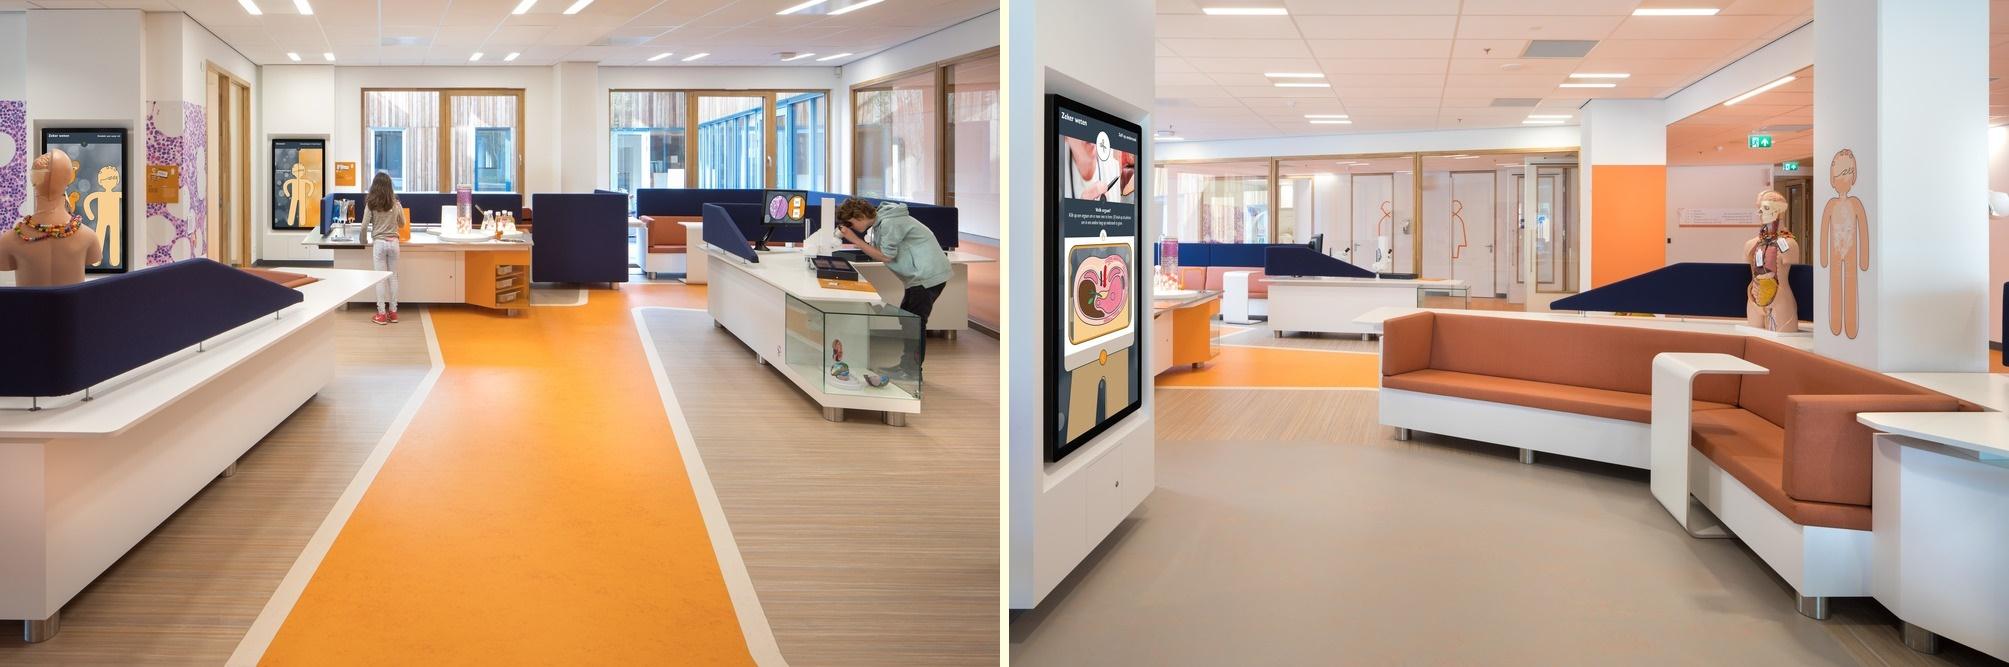 Center for Pediatric Oncology Princess Máxima Center